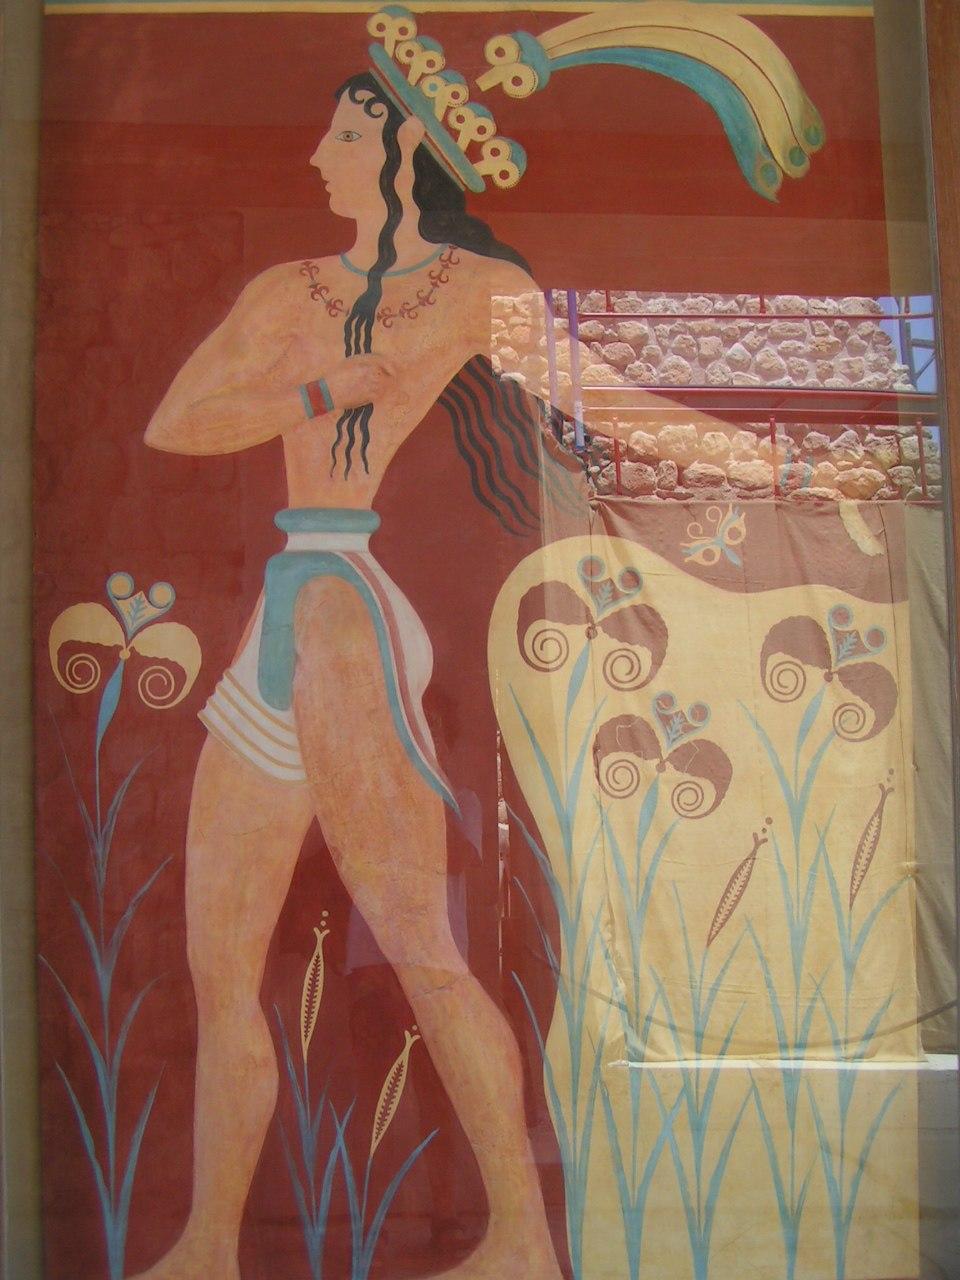 Knossos the prince of lillies